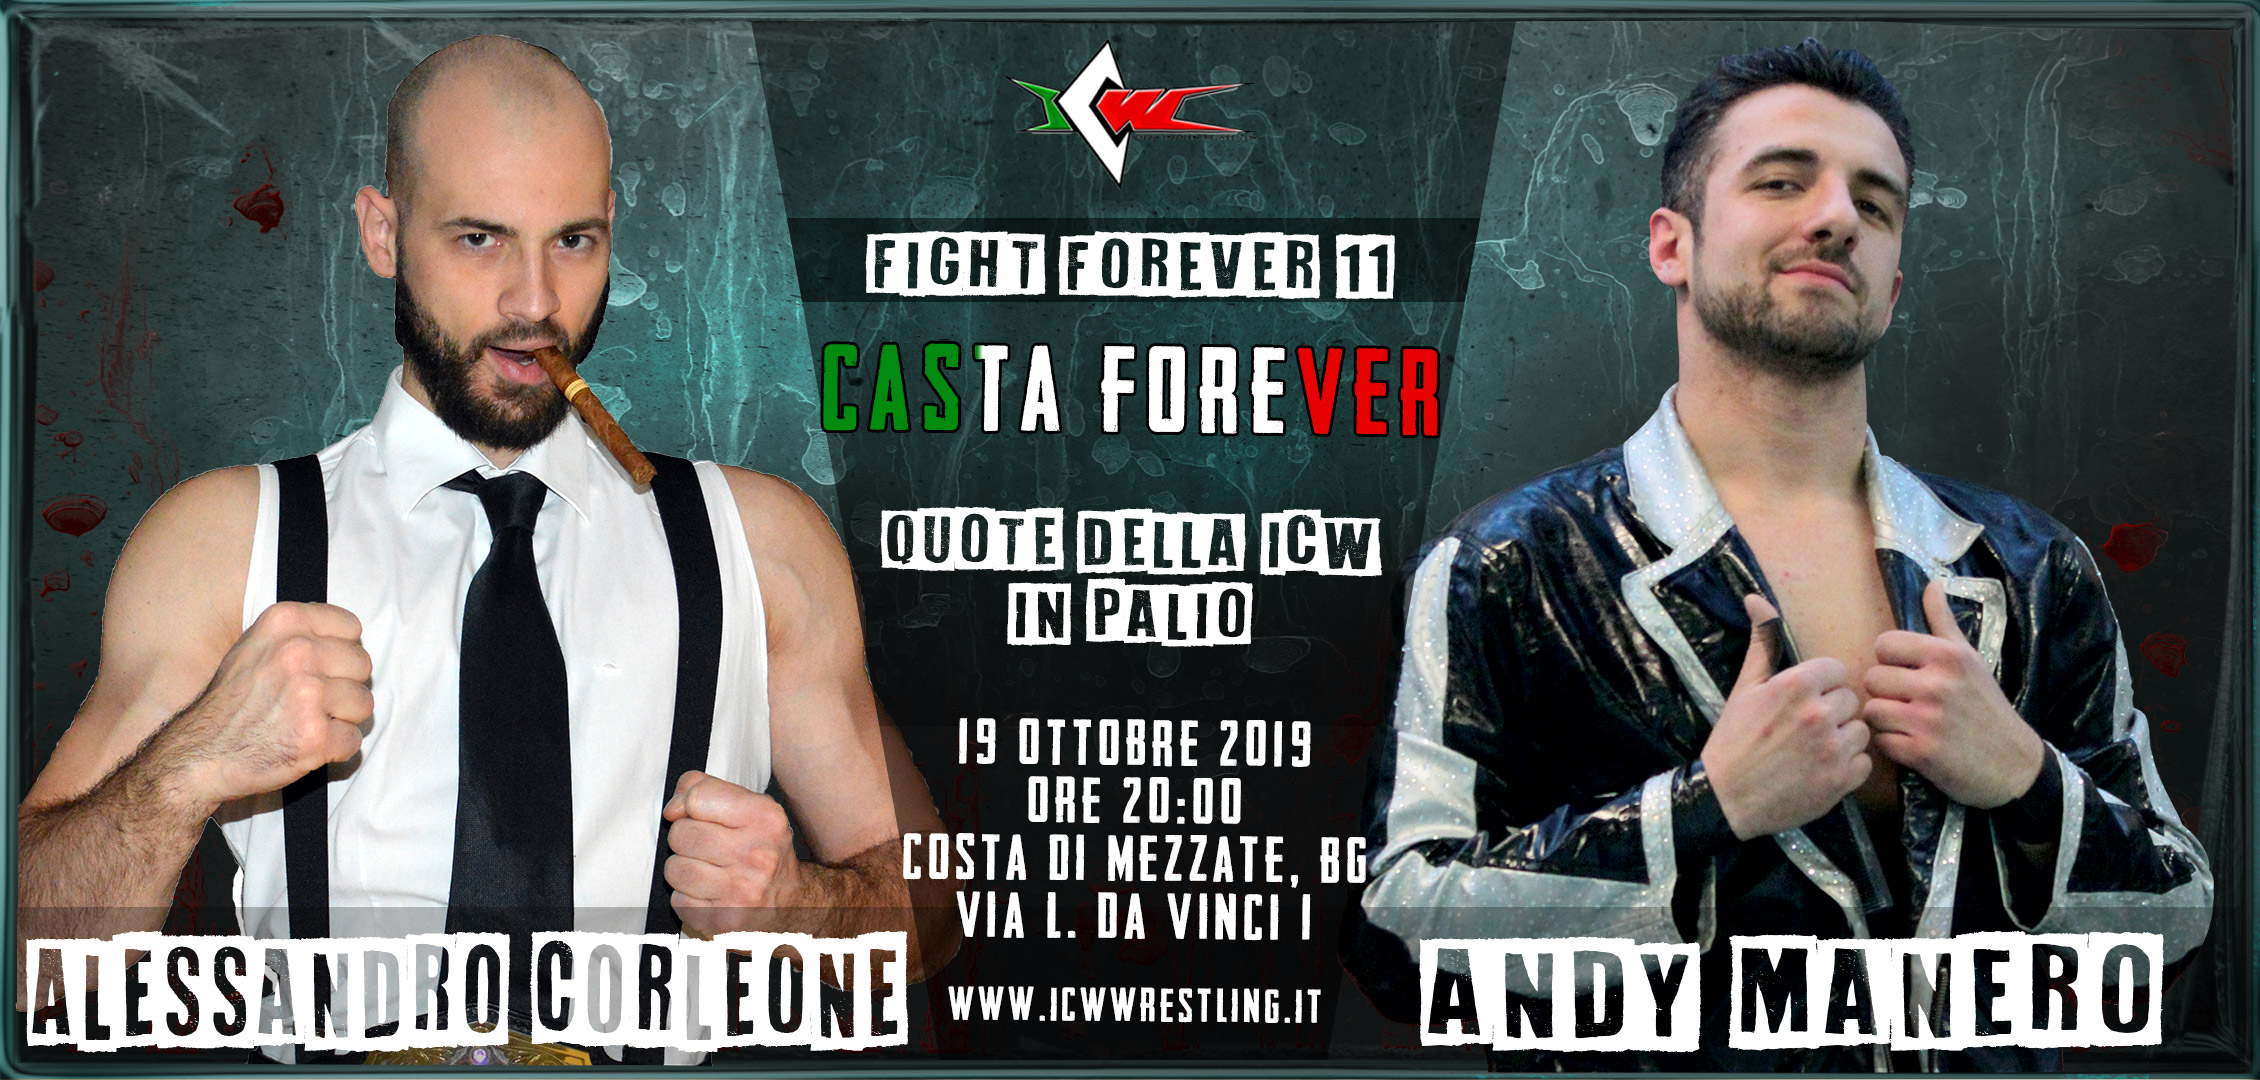 Sabato 19 Ottobre a Bergamo arriva ICW Fight Forever #11: Casta Forever!